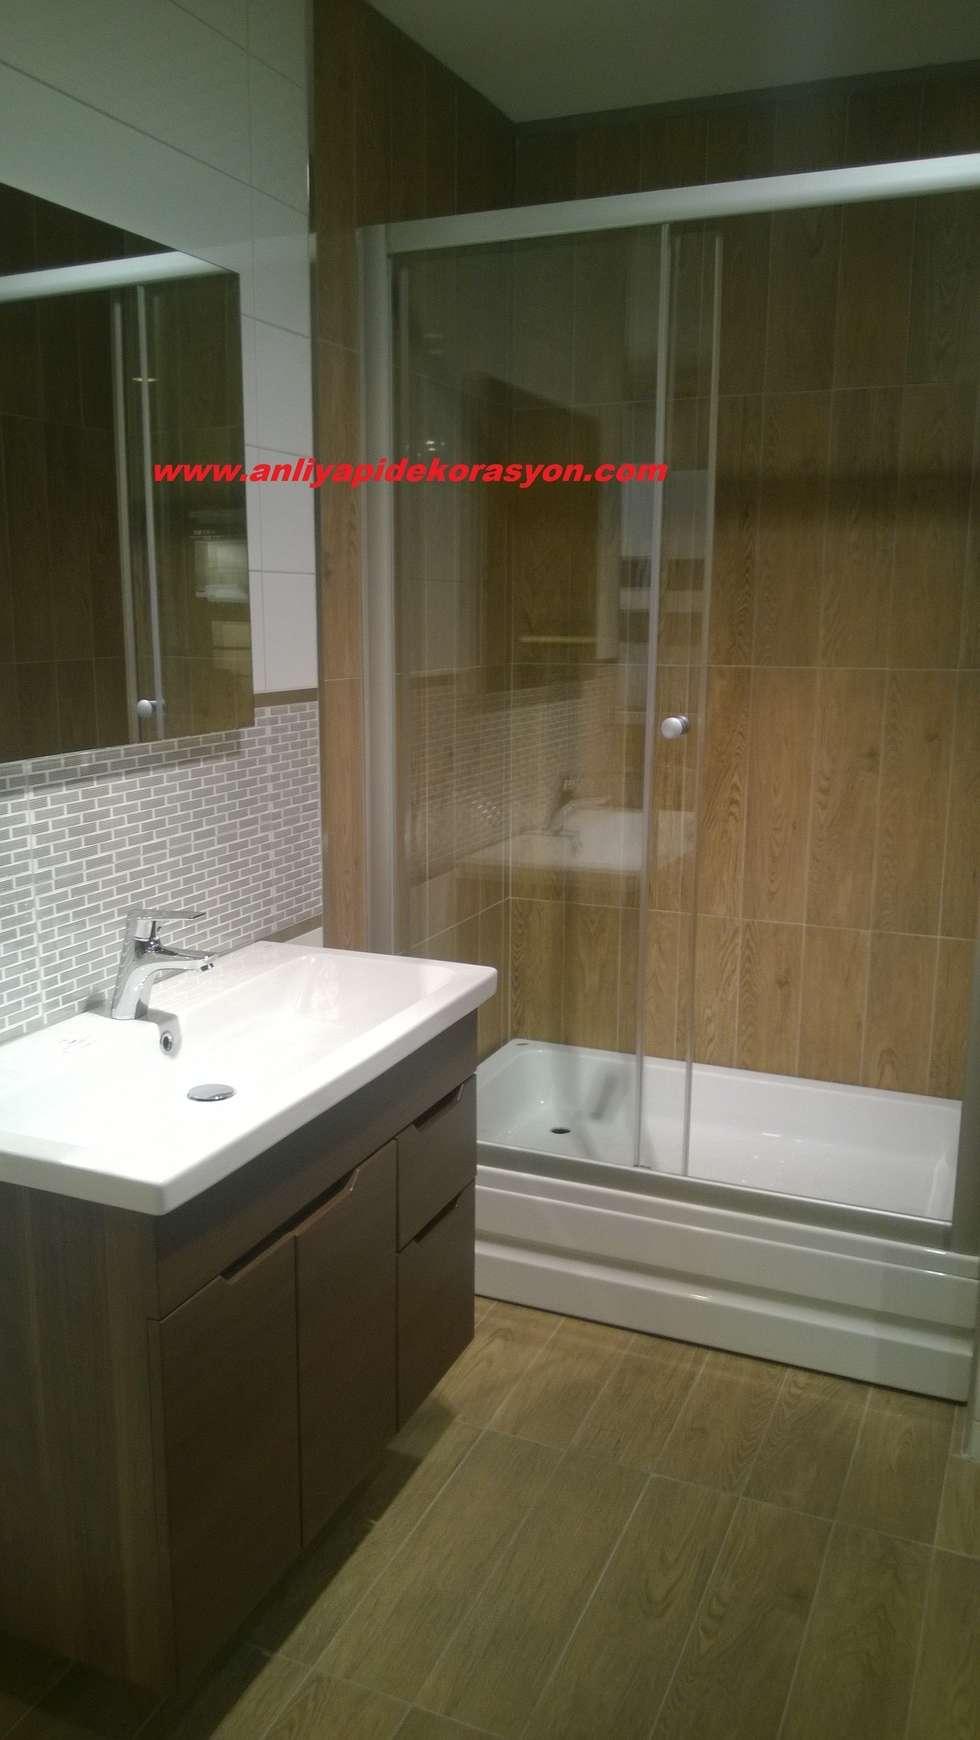 anlı yapı dekorasyon – anlı yapı dekorasyon: modern tarz Banyo